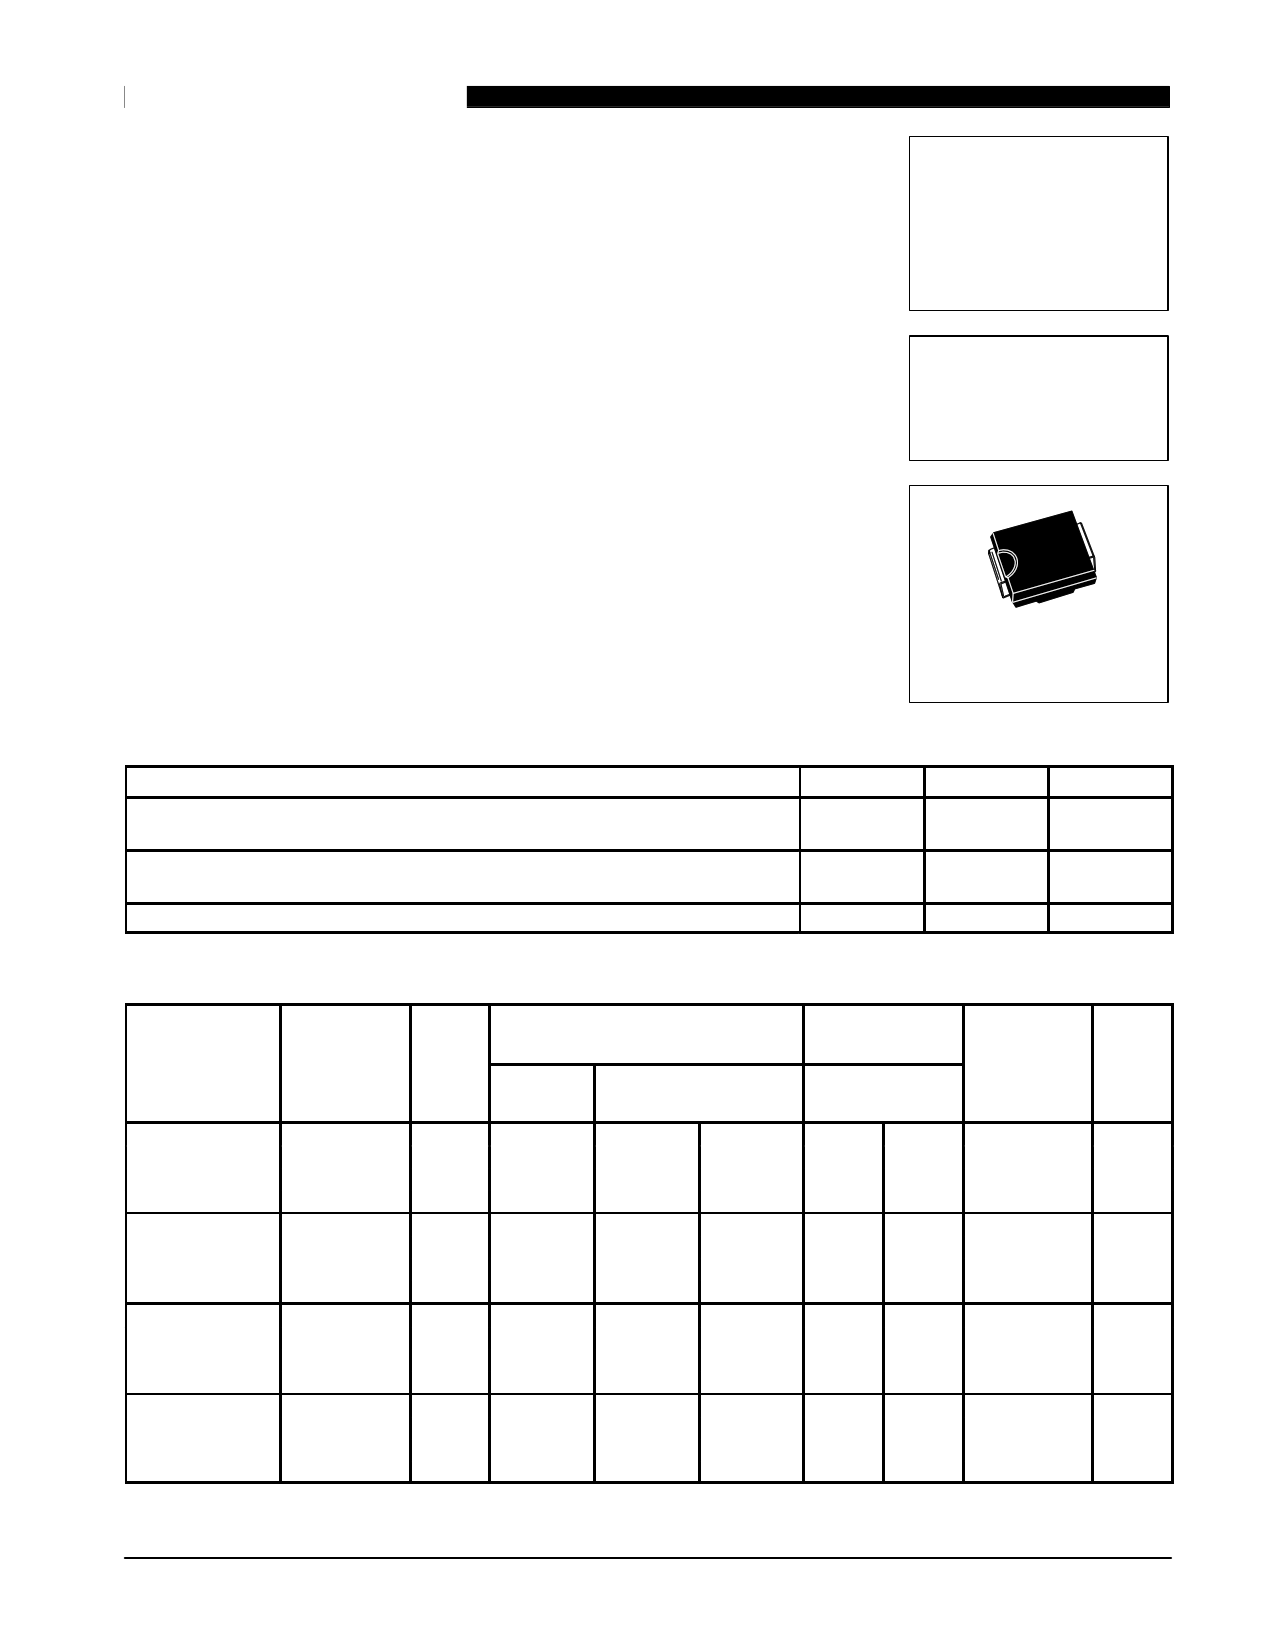 1SMB5916BT3 datasheet